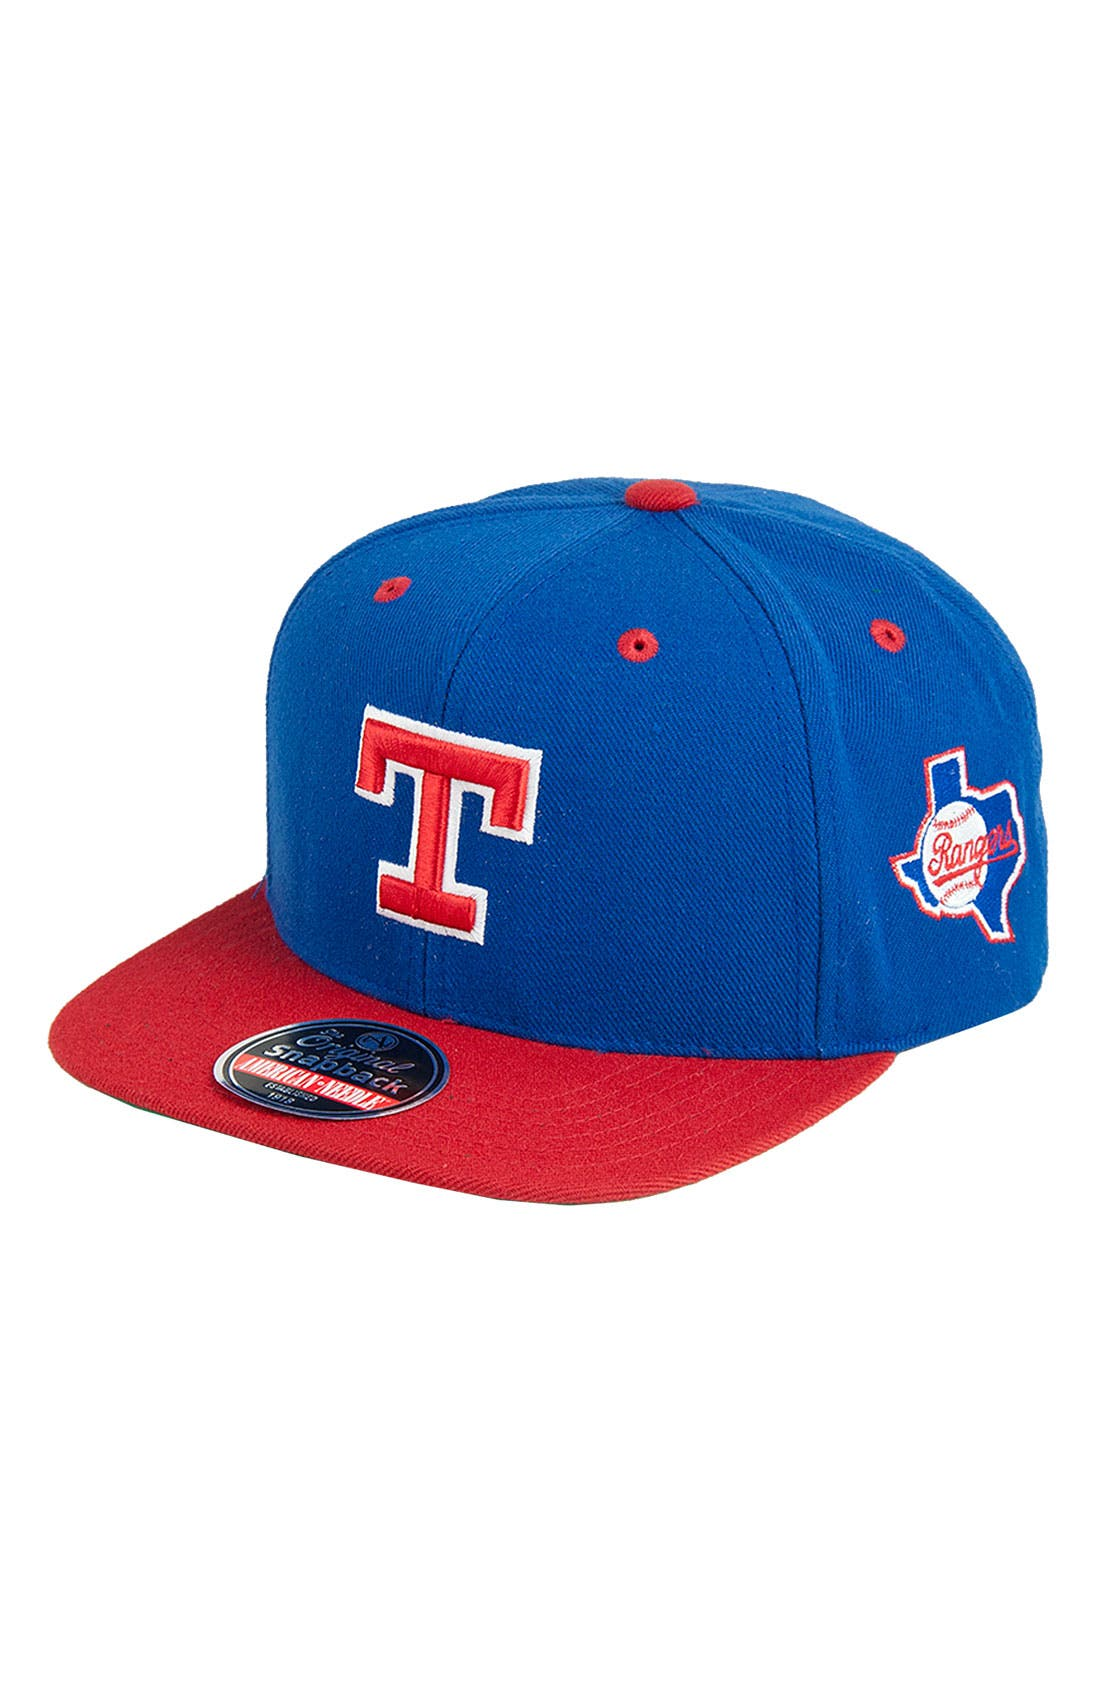 Alternate Image 1 Selected - American Needle 'Blockhead Rangers' Snapback Baseball Cap